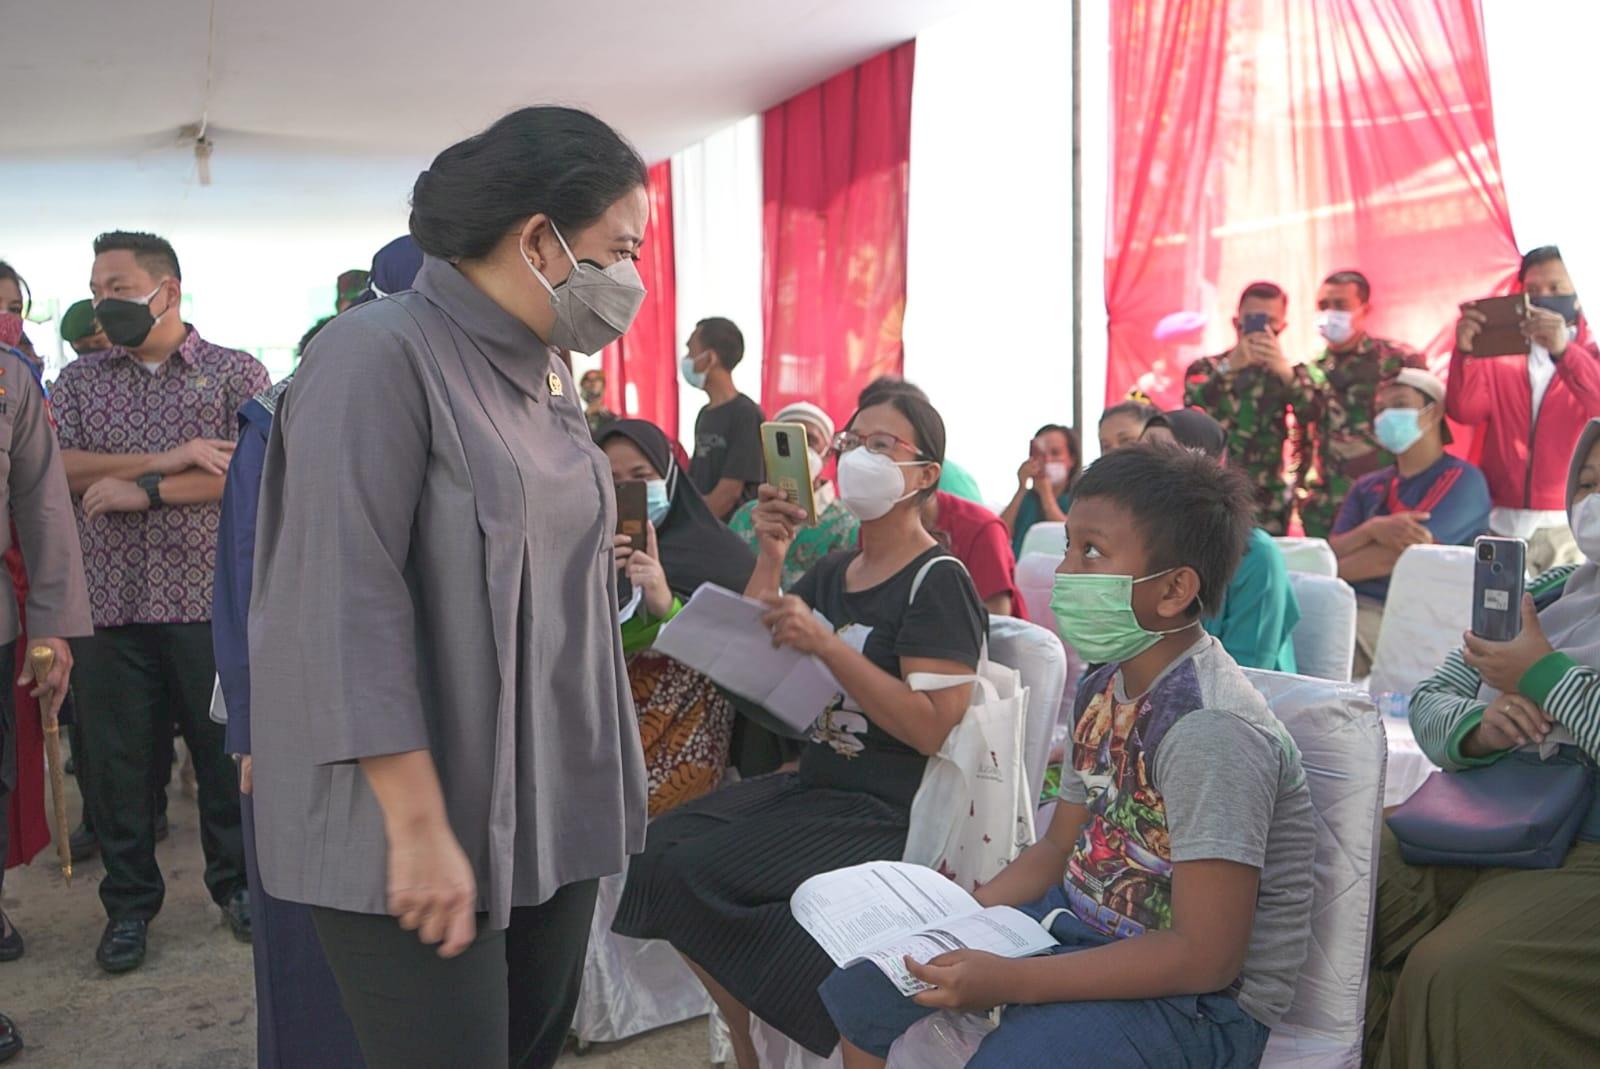 Pantau Vaksinasi di Tambora, Puan: Belum Ada yang Menyatakan Covid-19 Akan Hilang